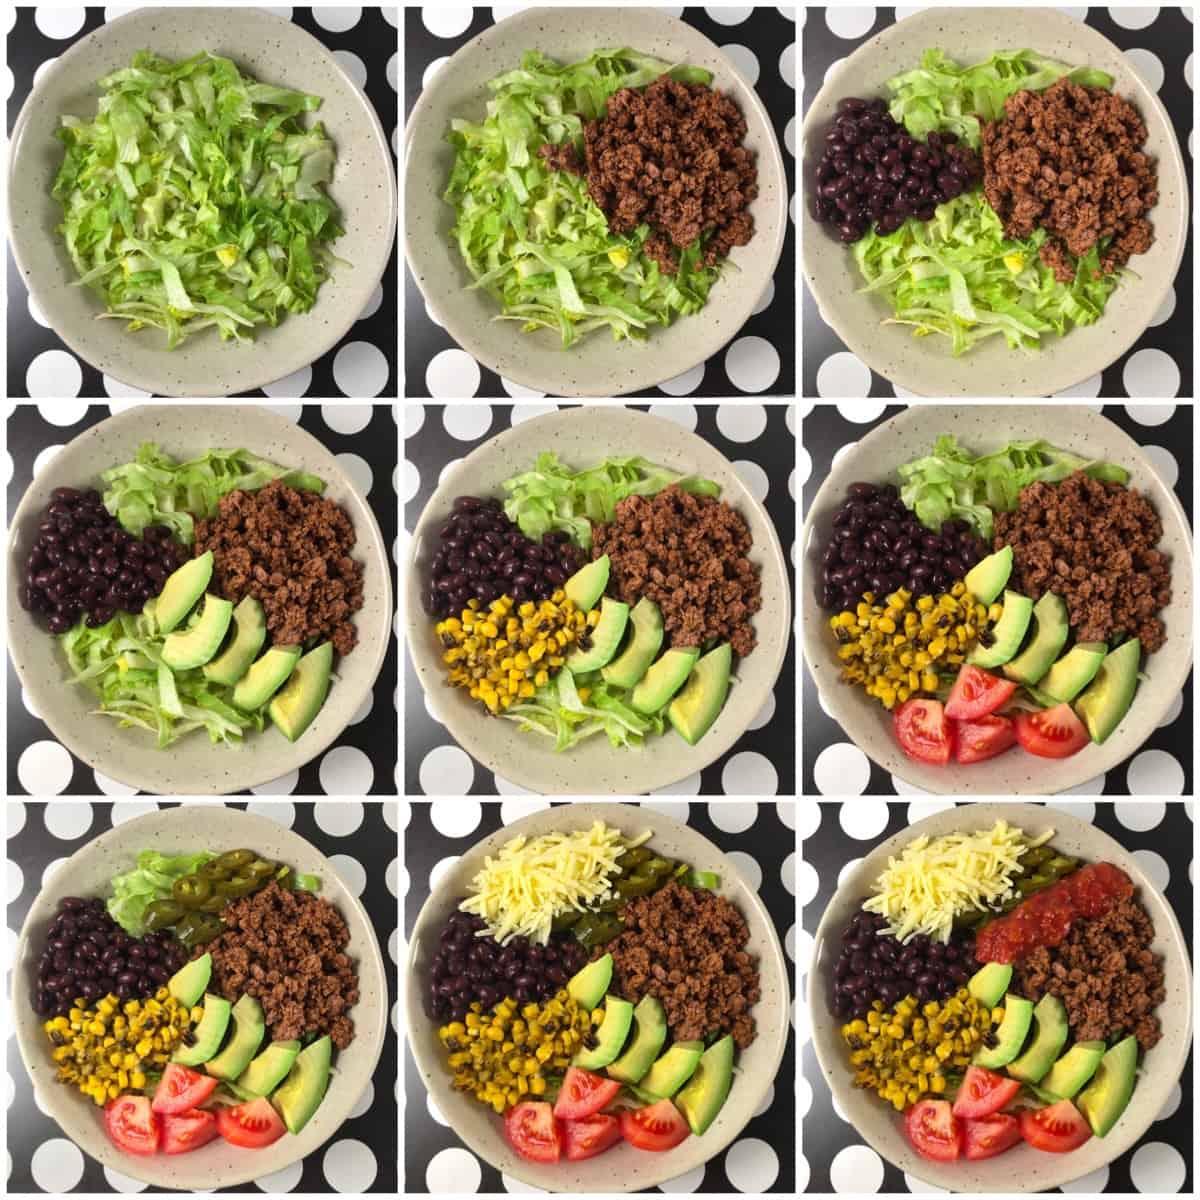 ground beef taco bowls